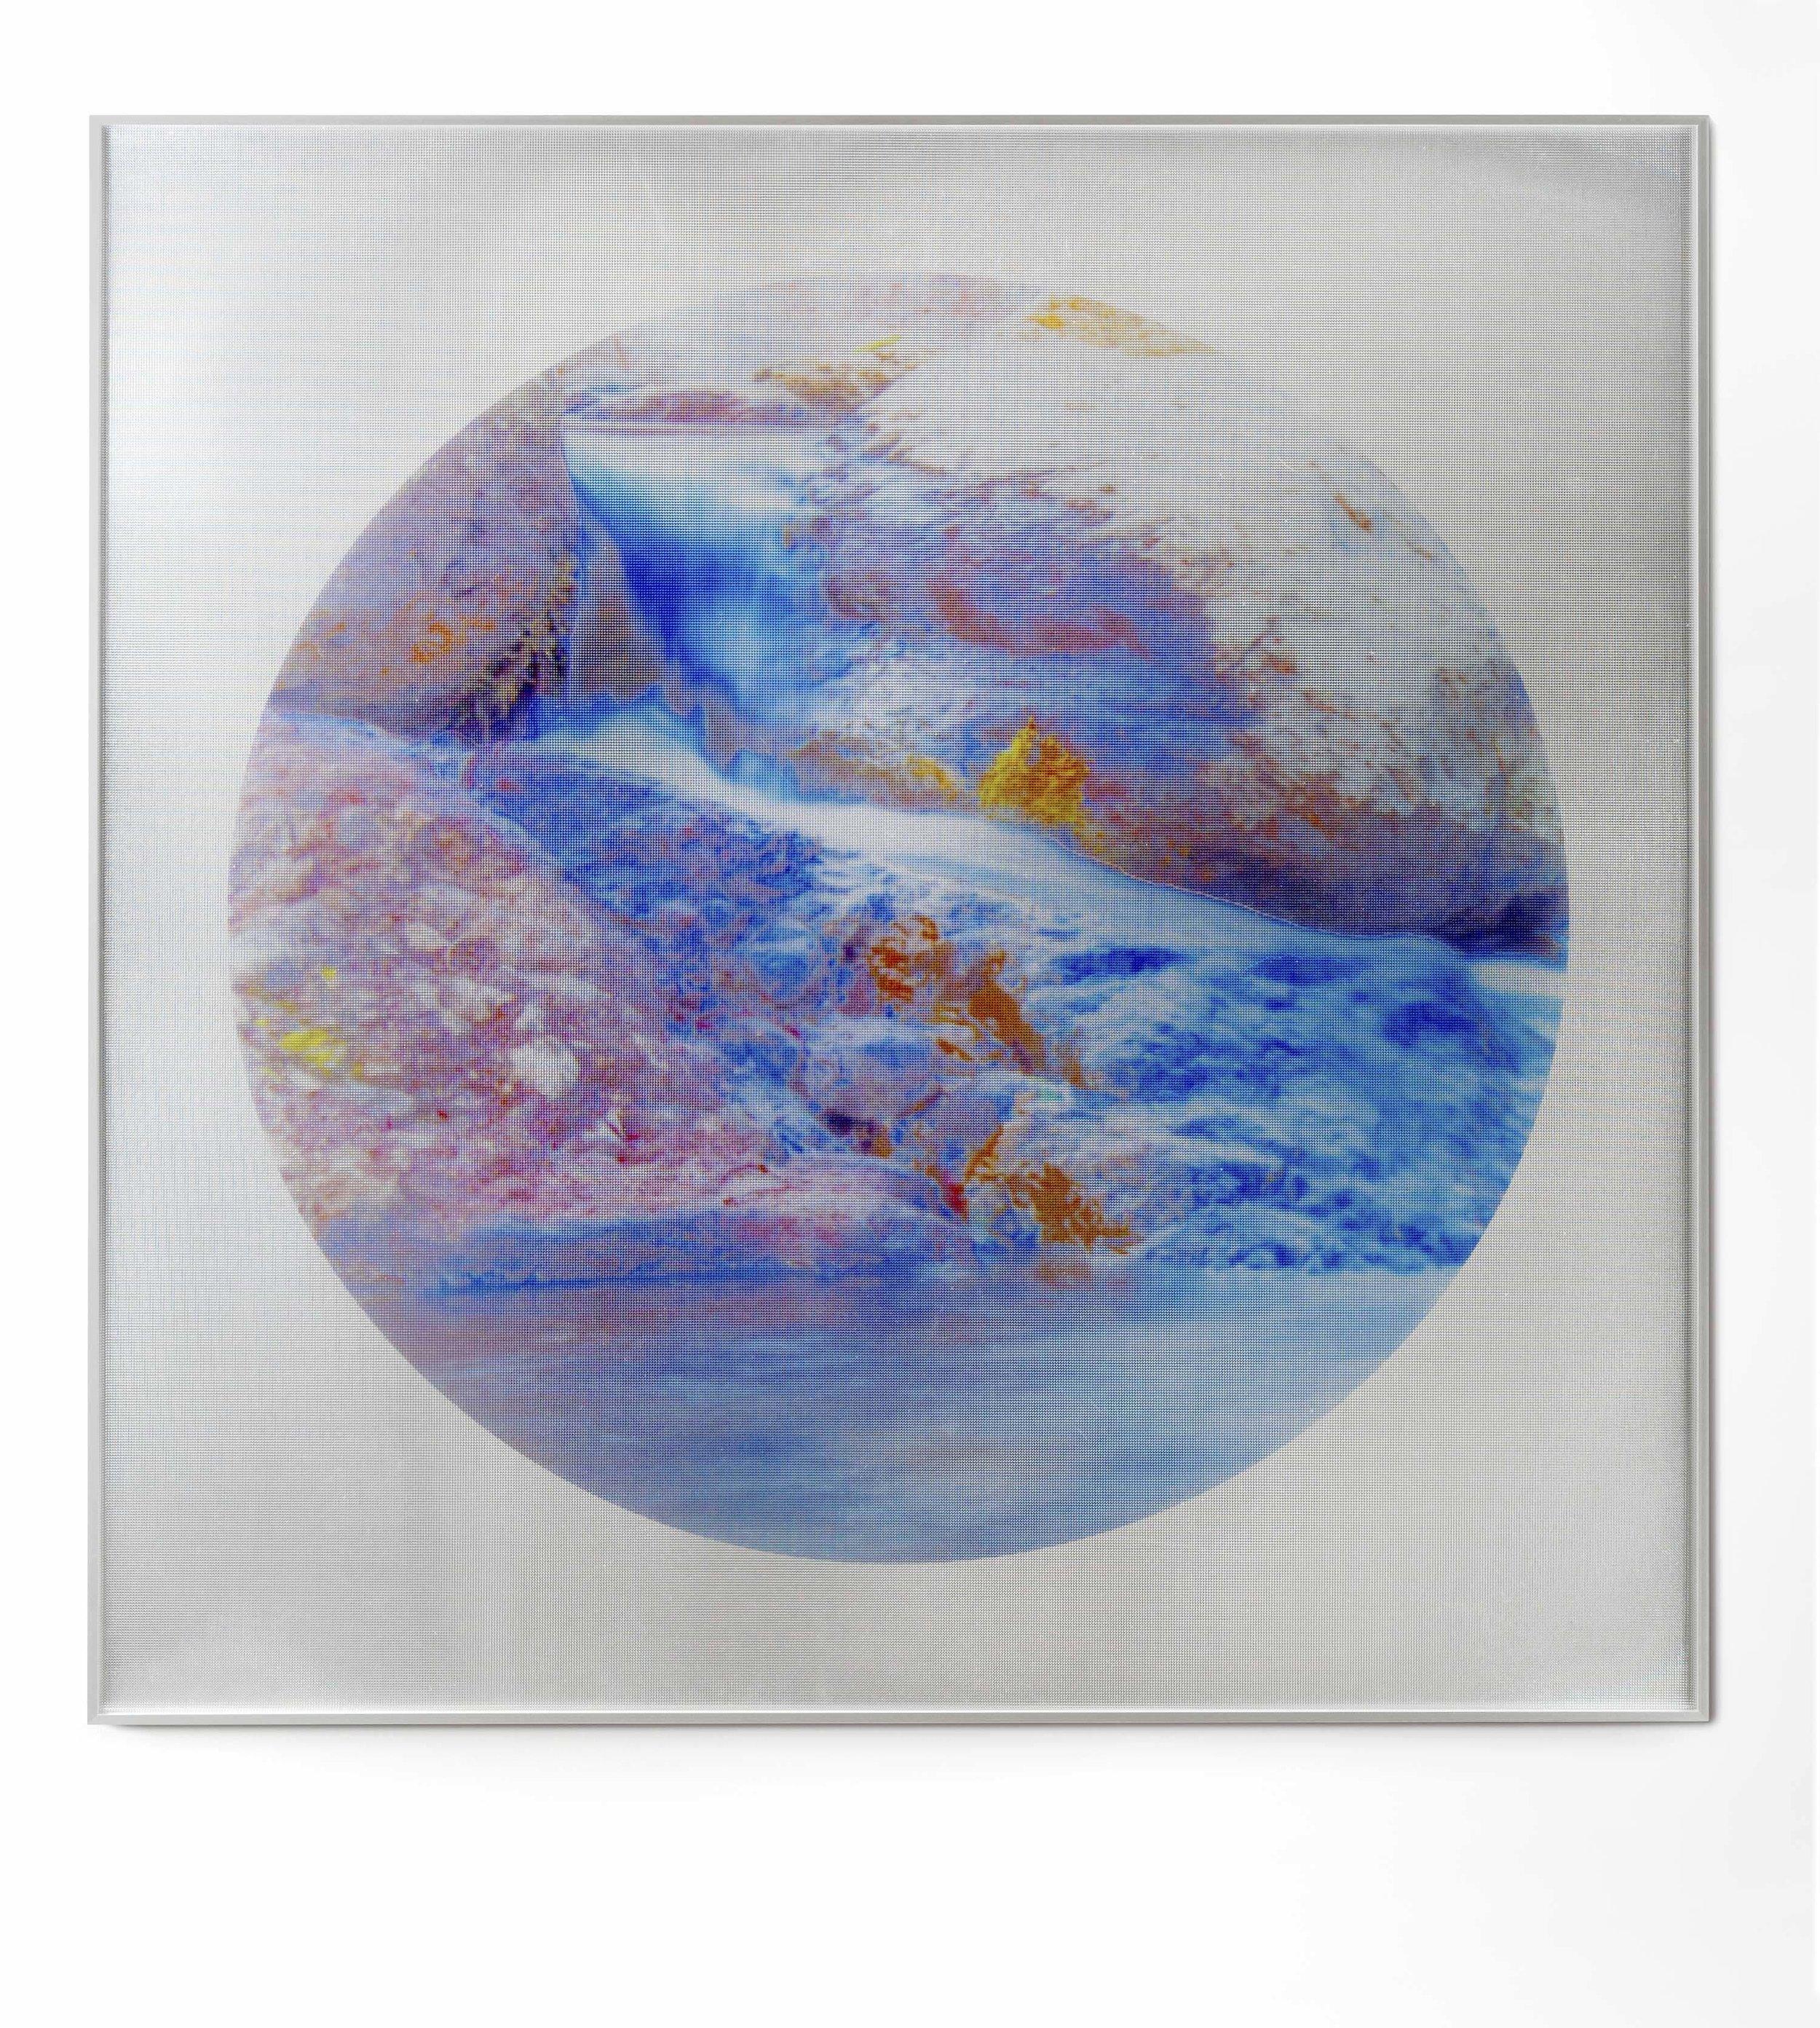 Beyond the Oecumene / Part XXVI,  2019 Aquarelle, wax pastels, UV-print on mirror beneath structured Plexiglas 120 x 120 cm (47 x 47 in)